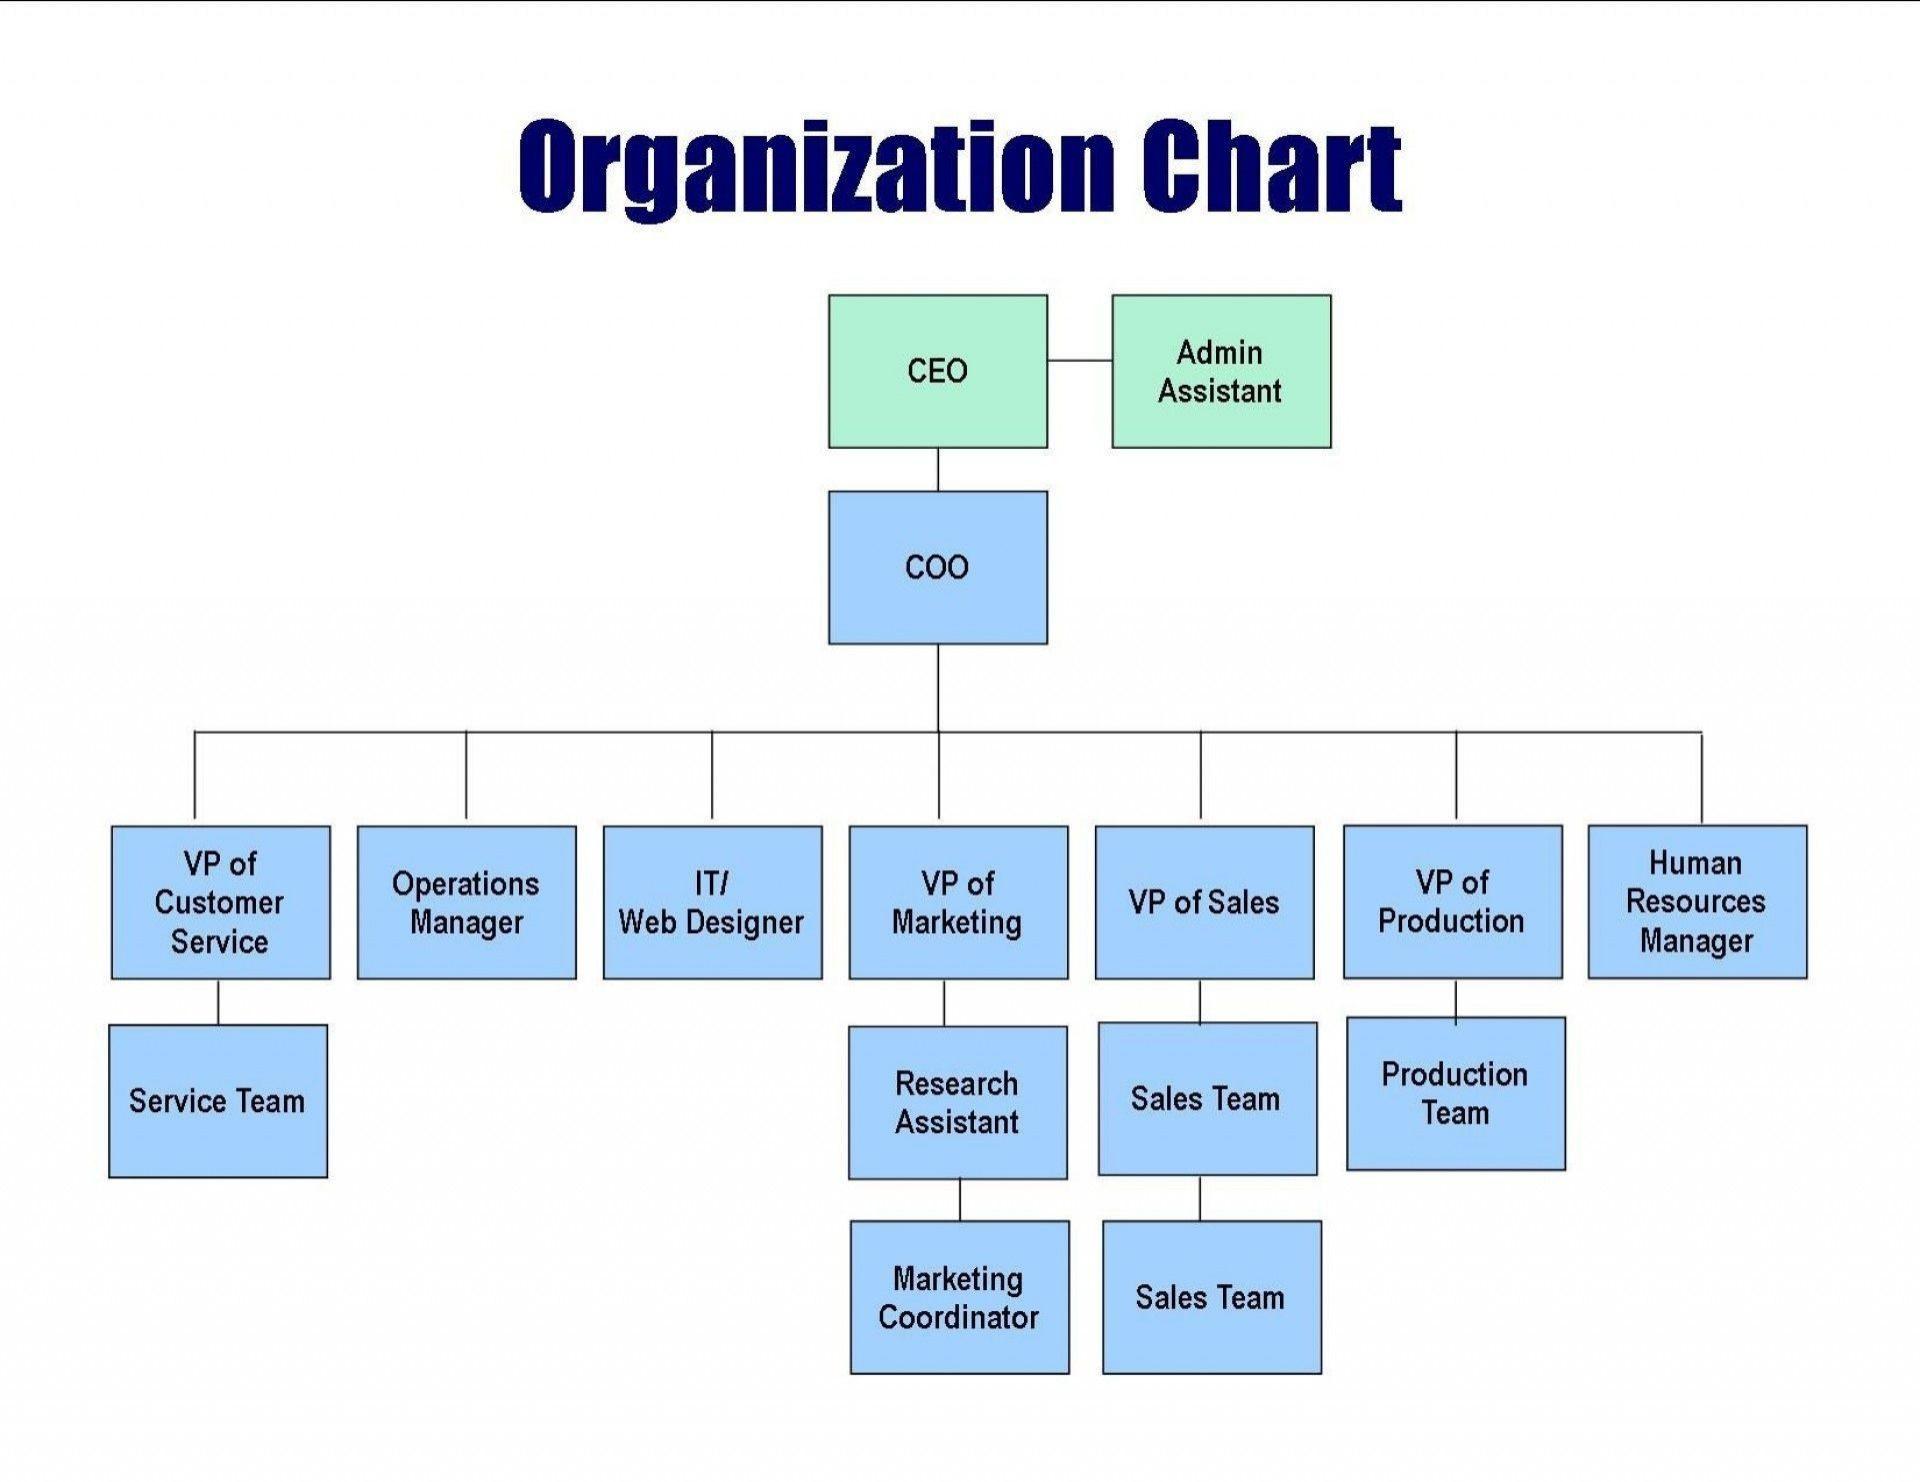 009 Unbelievable Organization Chart Template Word 2013 Photo  Organizational Free Microsoft1920